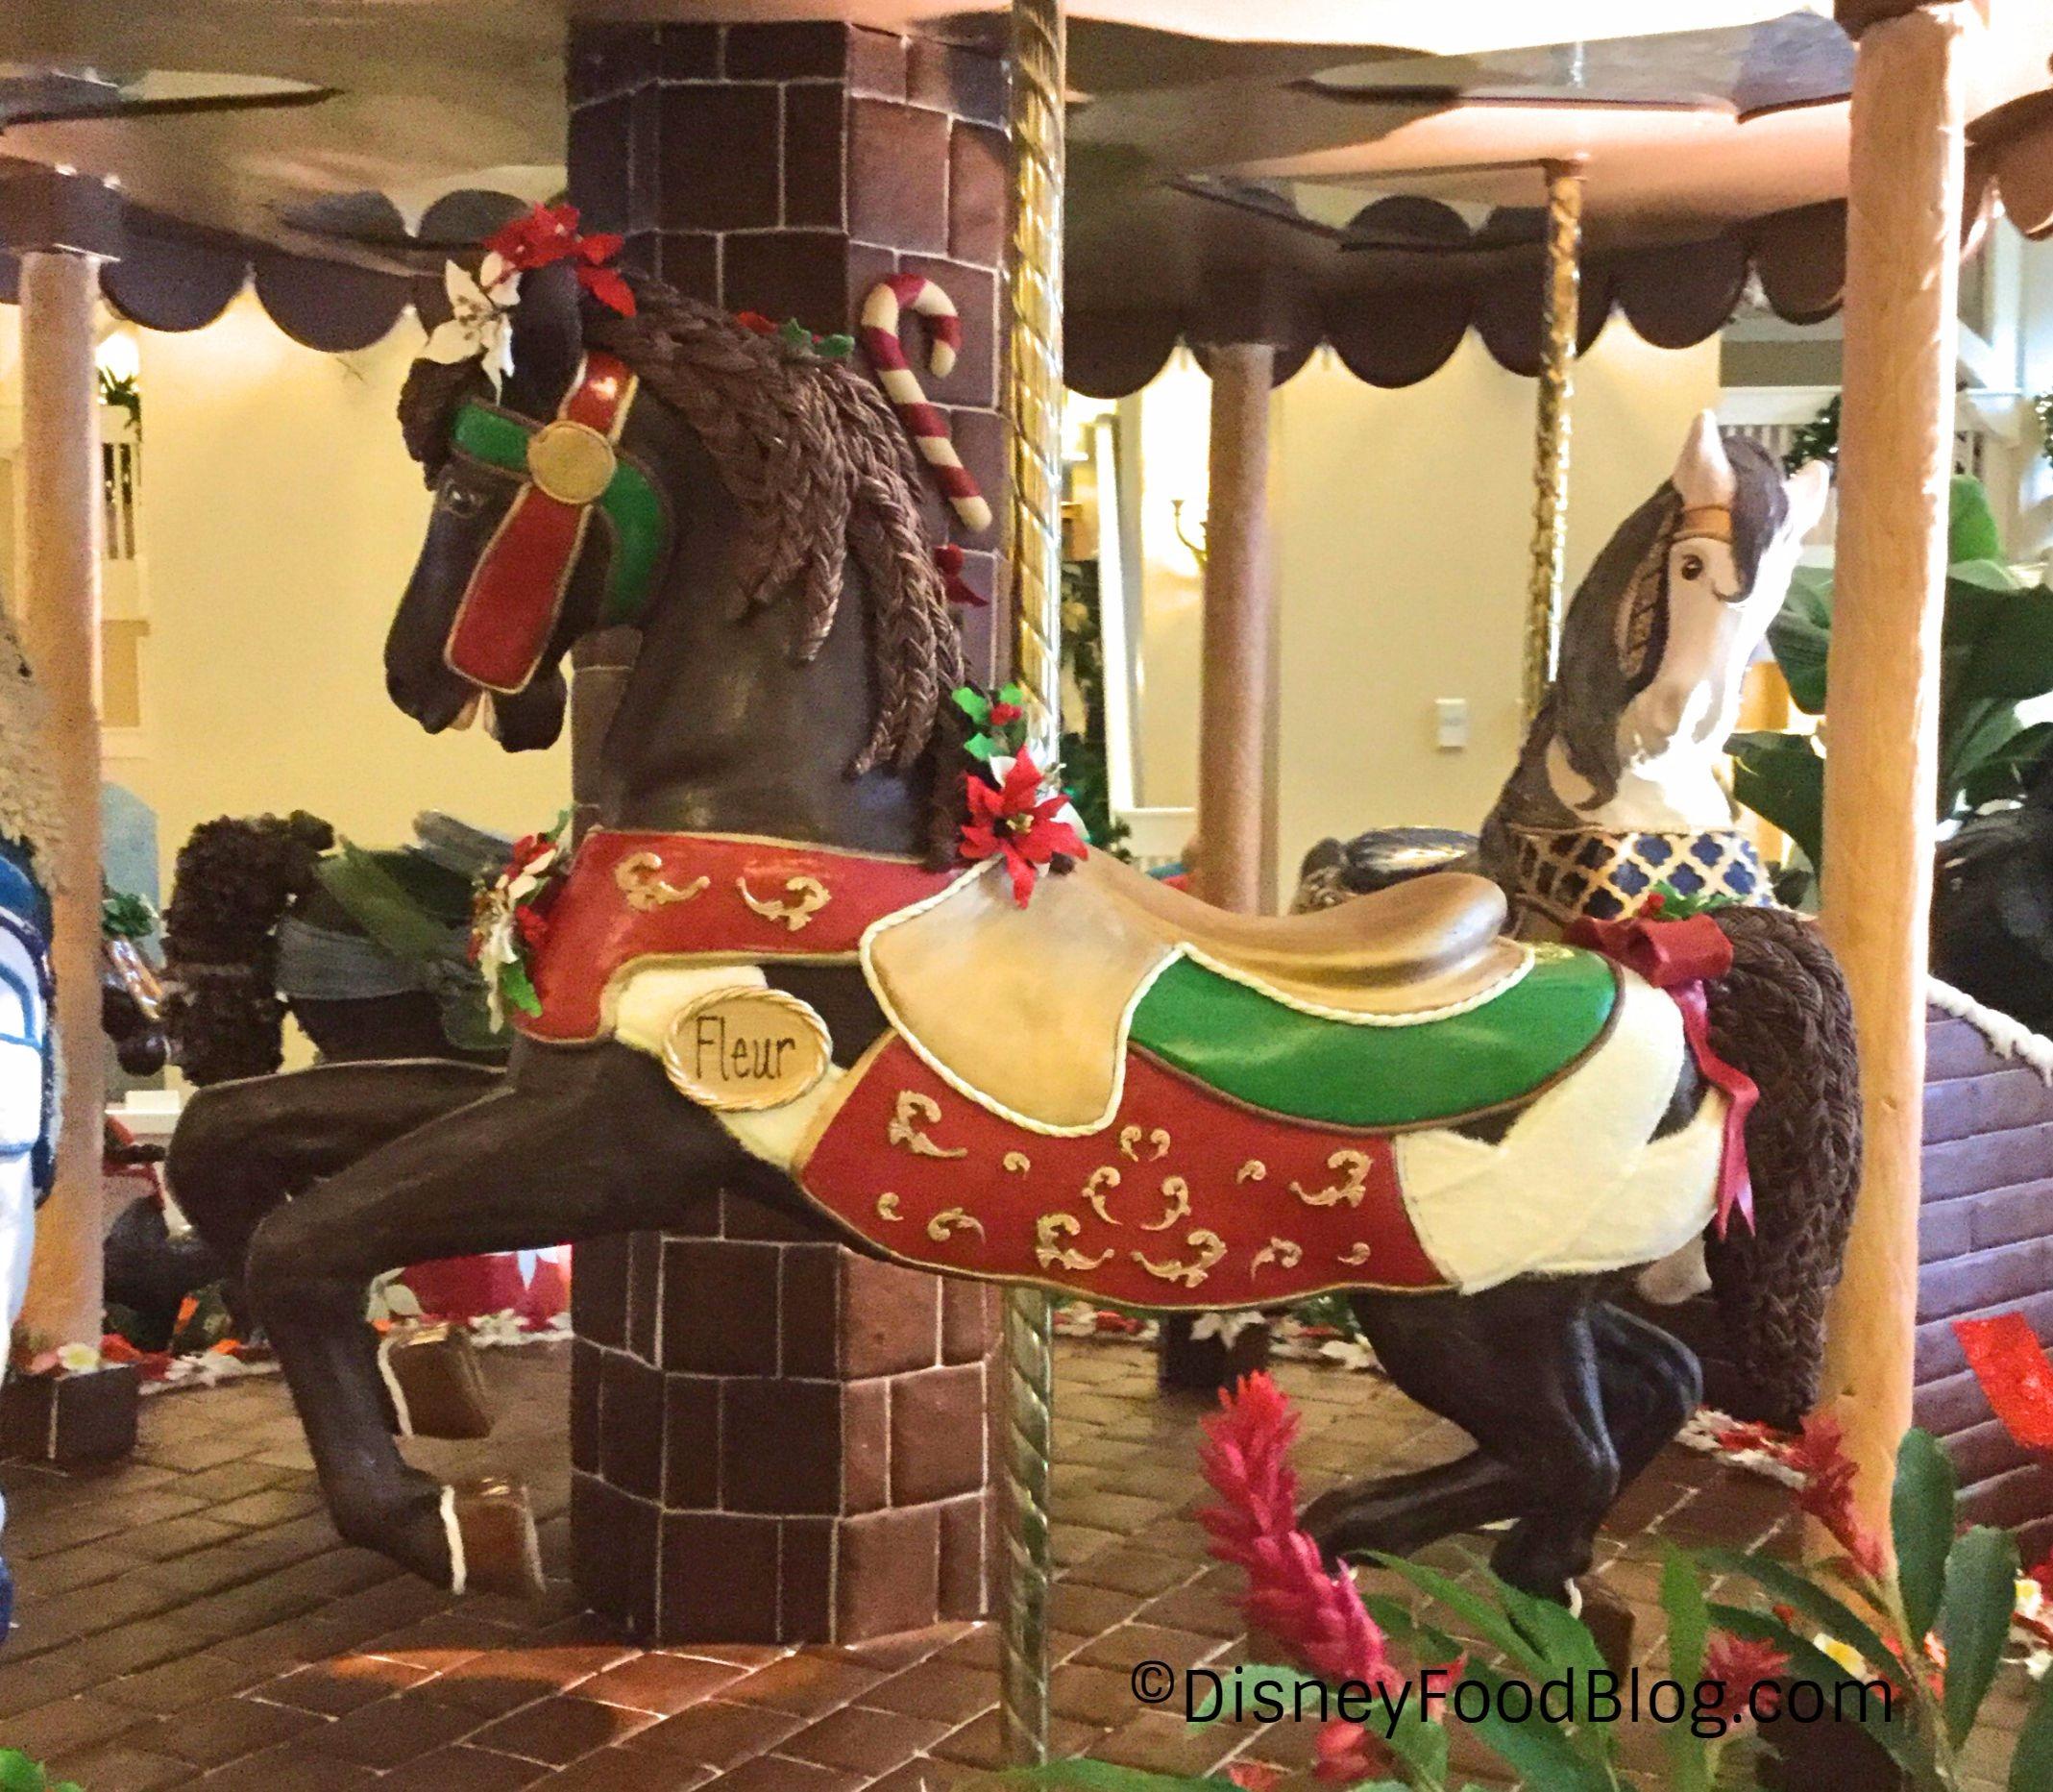 The 2017 Gingerbread Carousel at Disney's Beach Club Resort